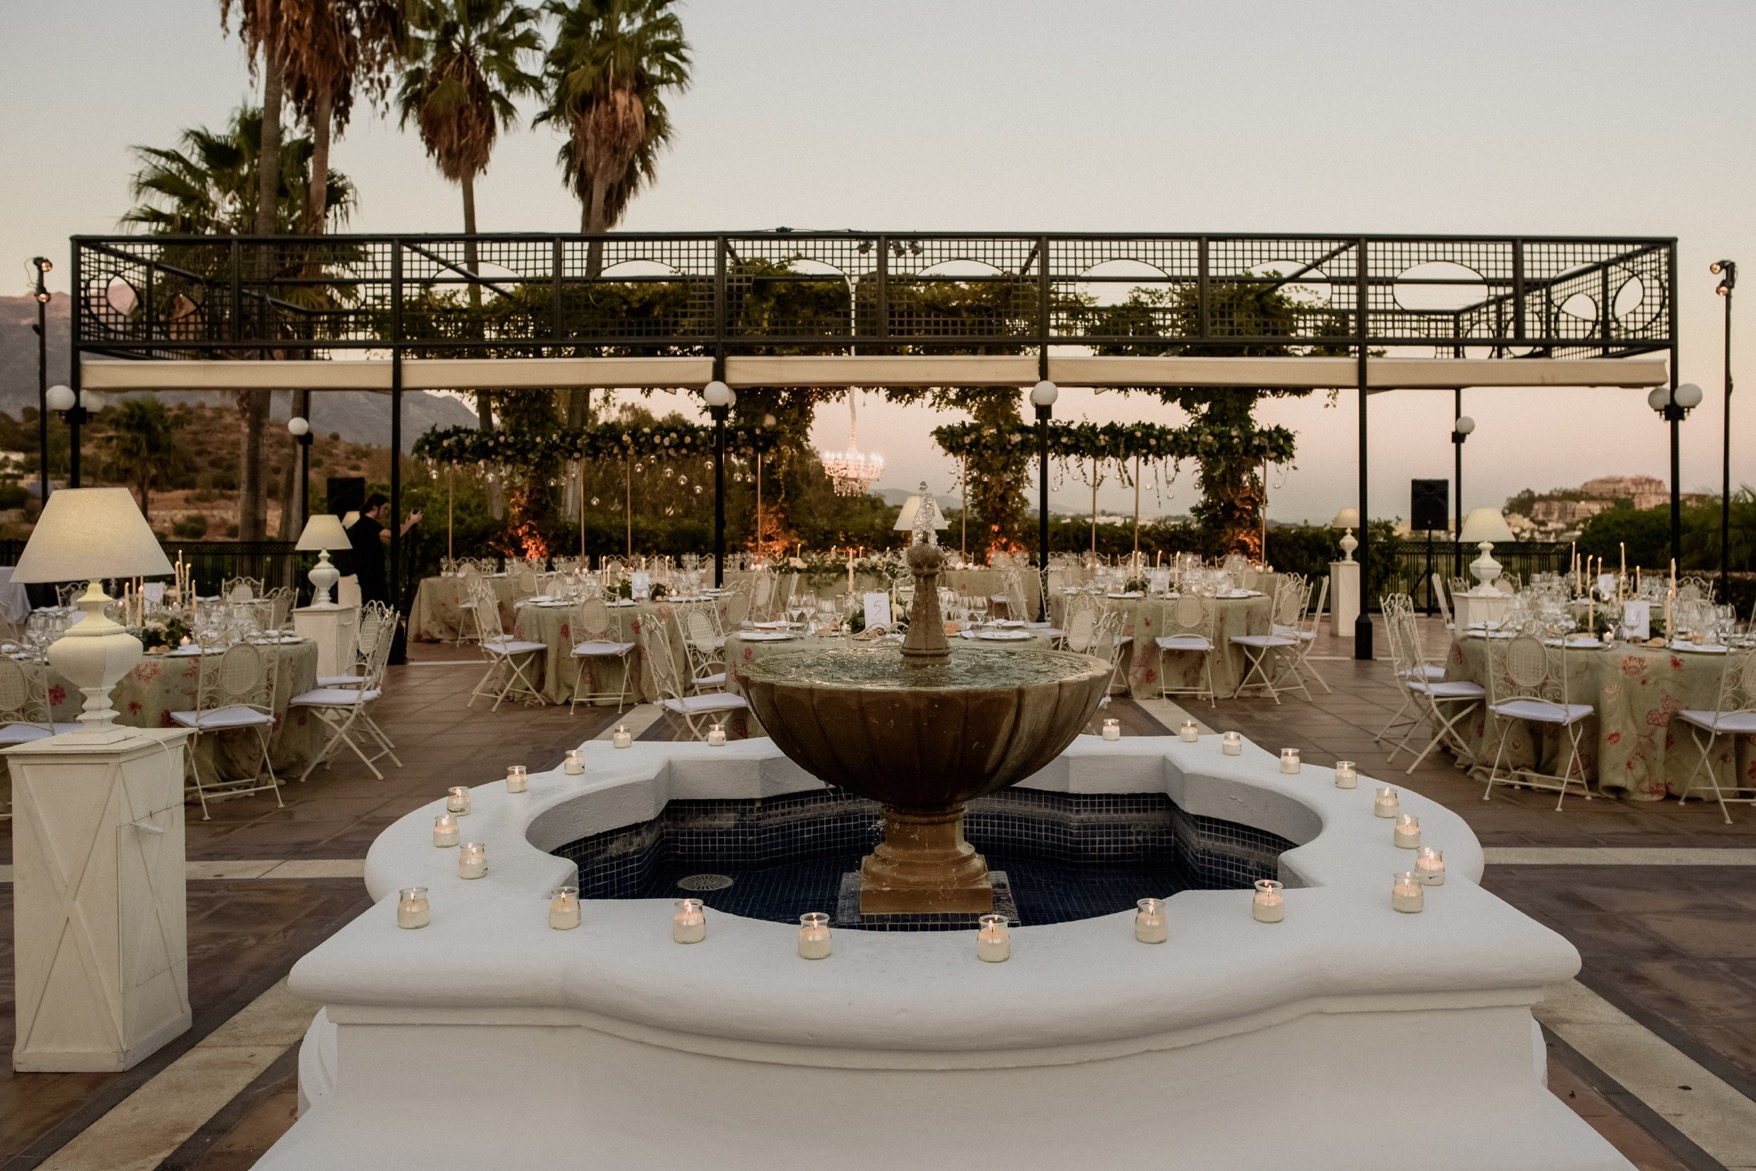 Si-Quiero-Wedding-Planner-By-Sira-Antequera-Bodas-Málaga-Marbella-Miami-19